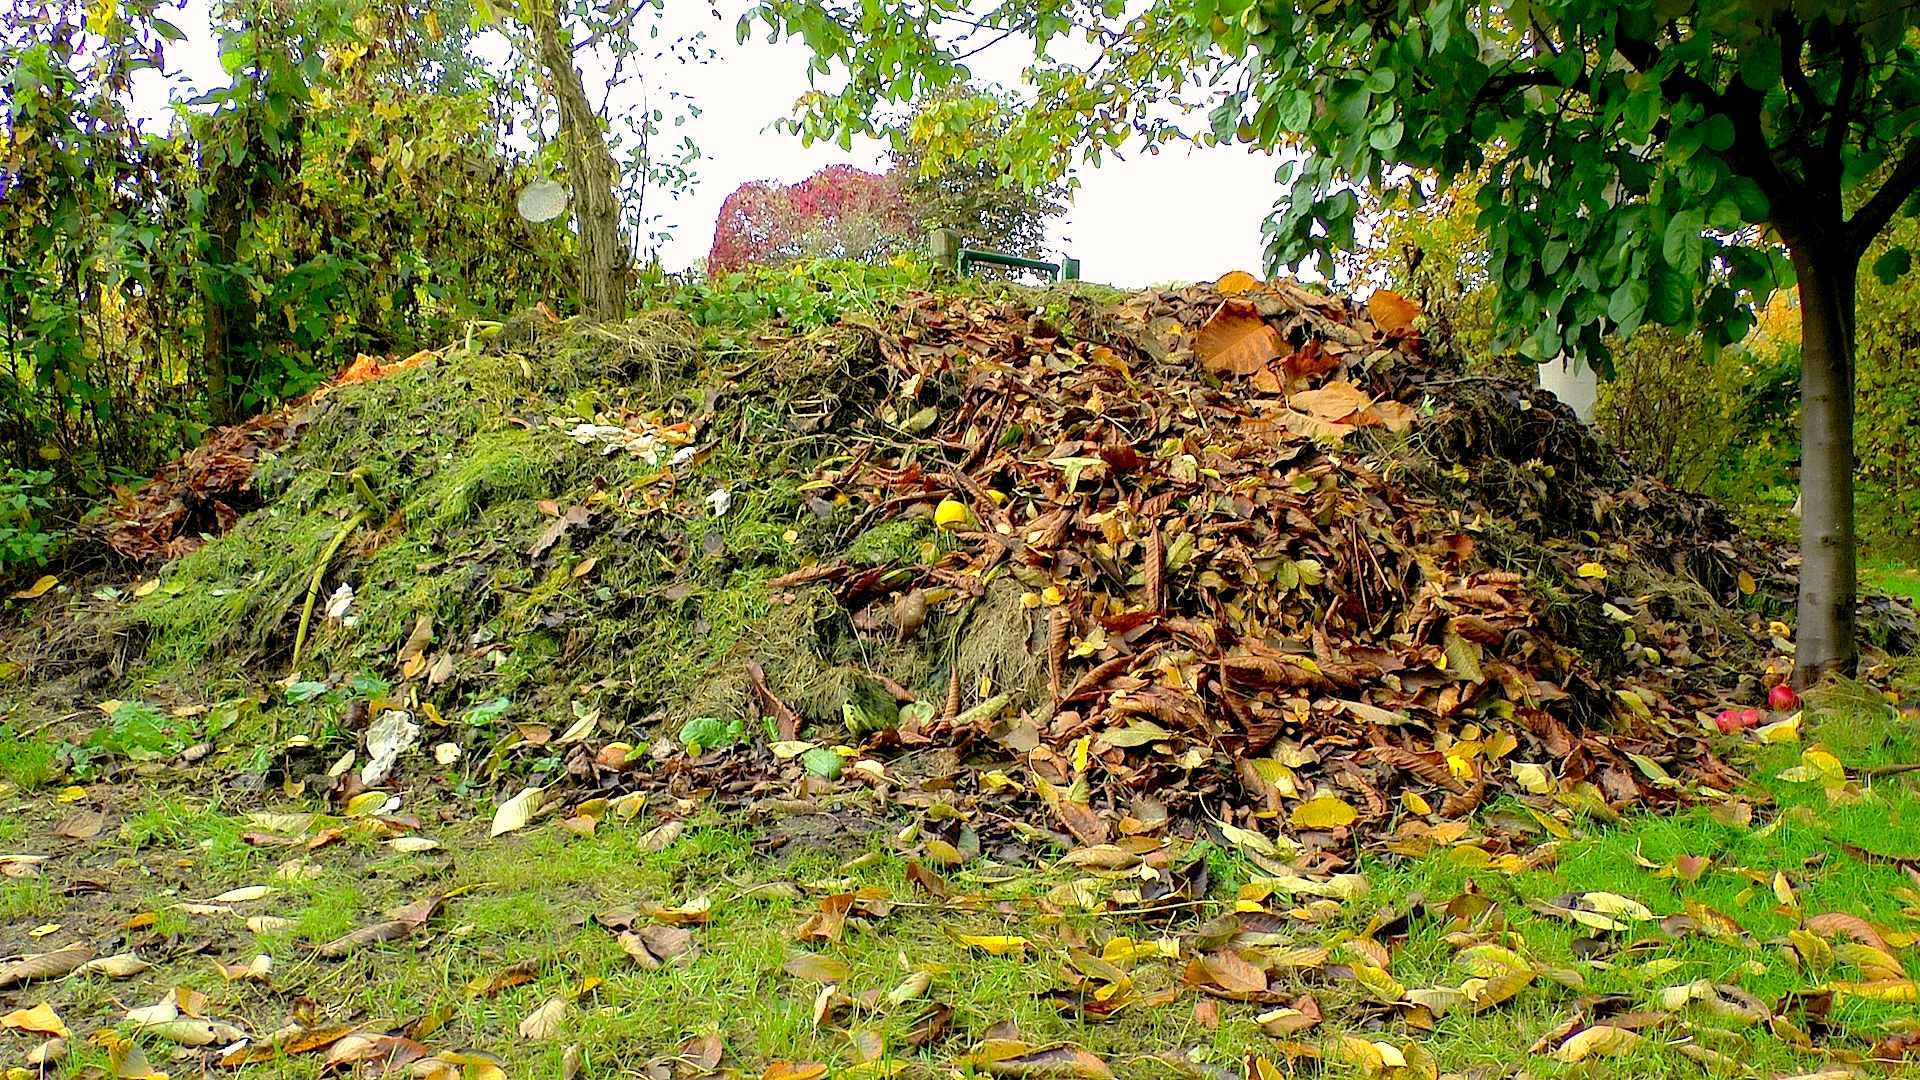 akb-komposthaufen-herbst